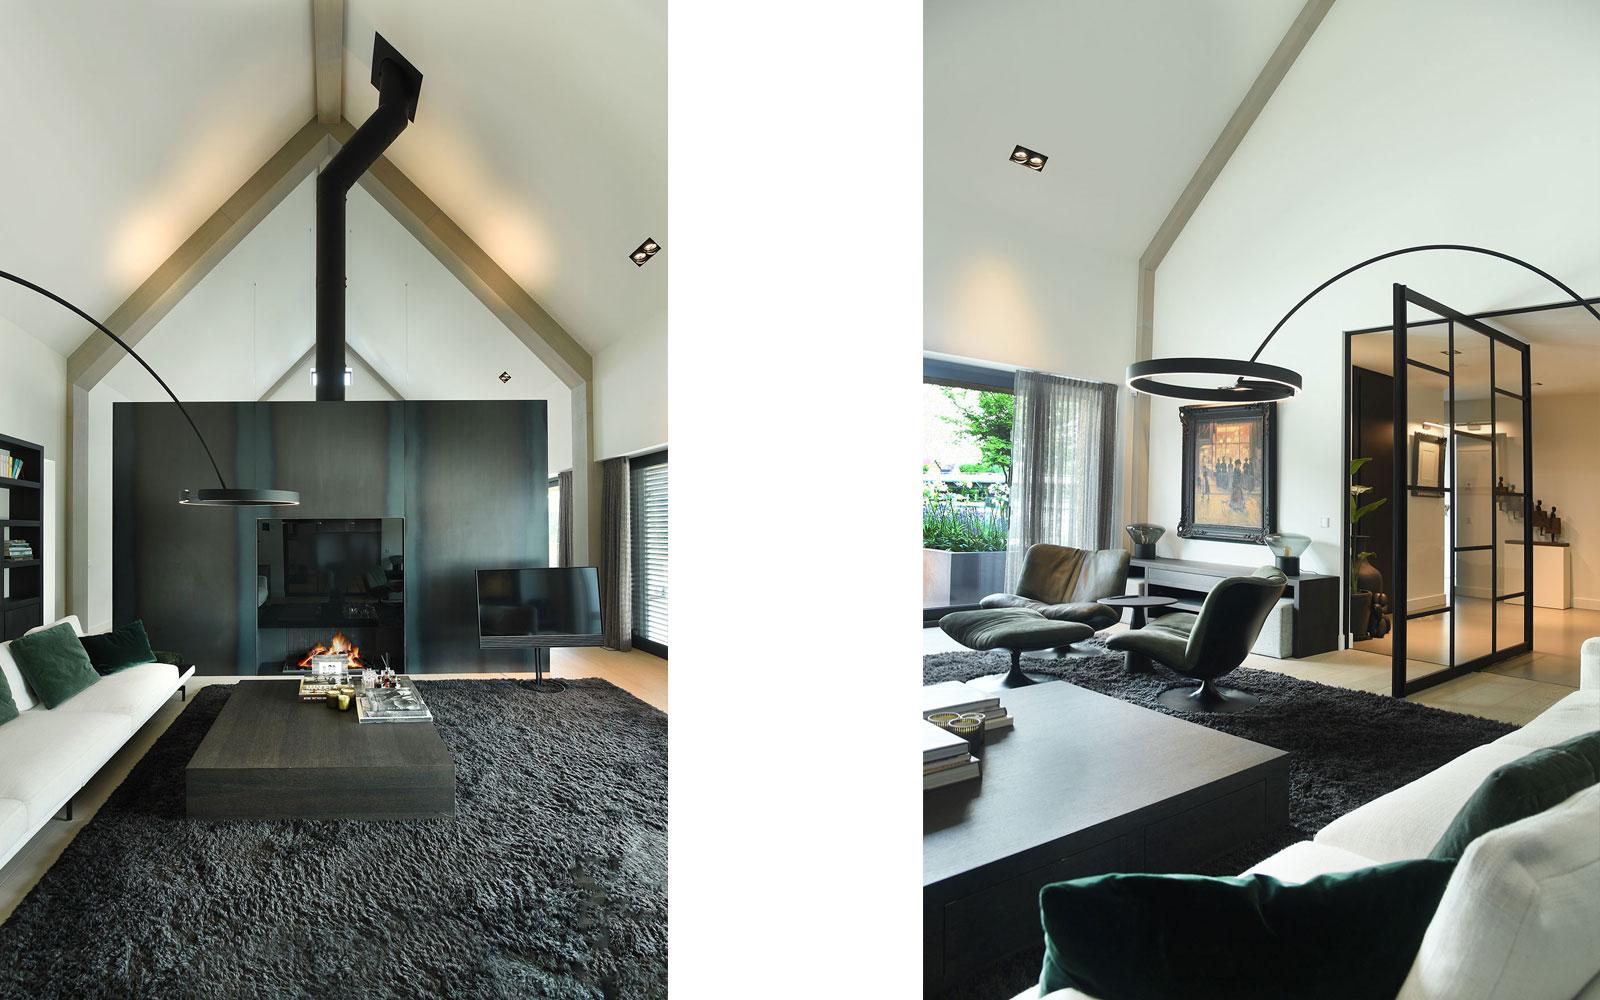 Baxter interieur project Van der Donk